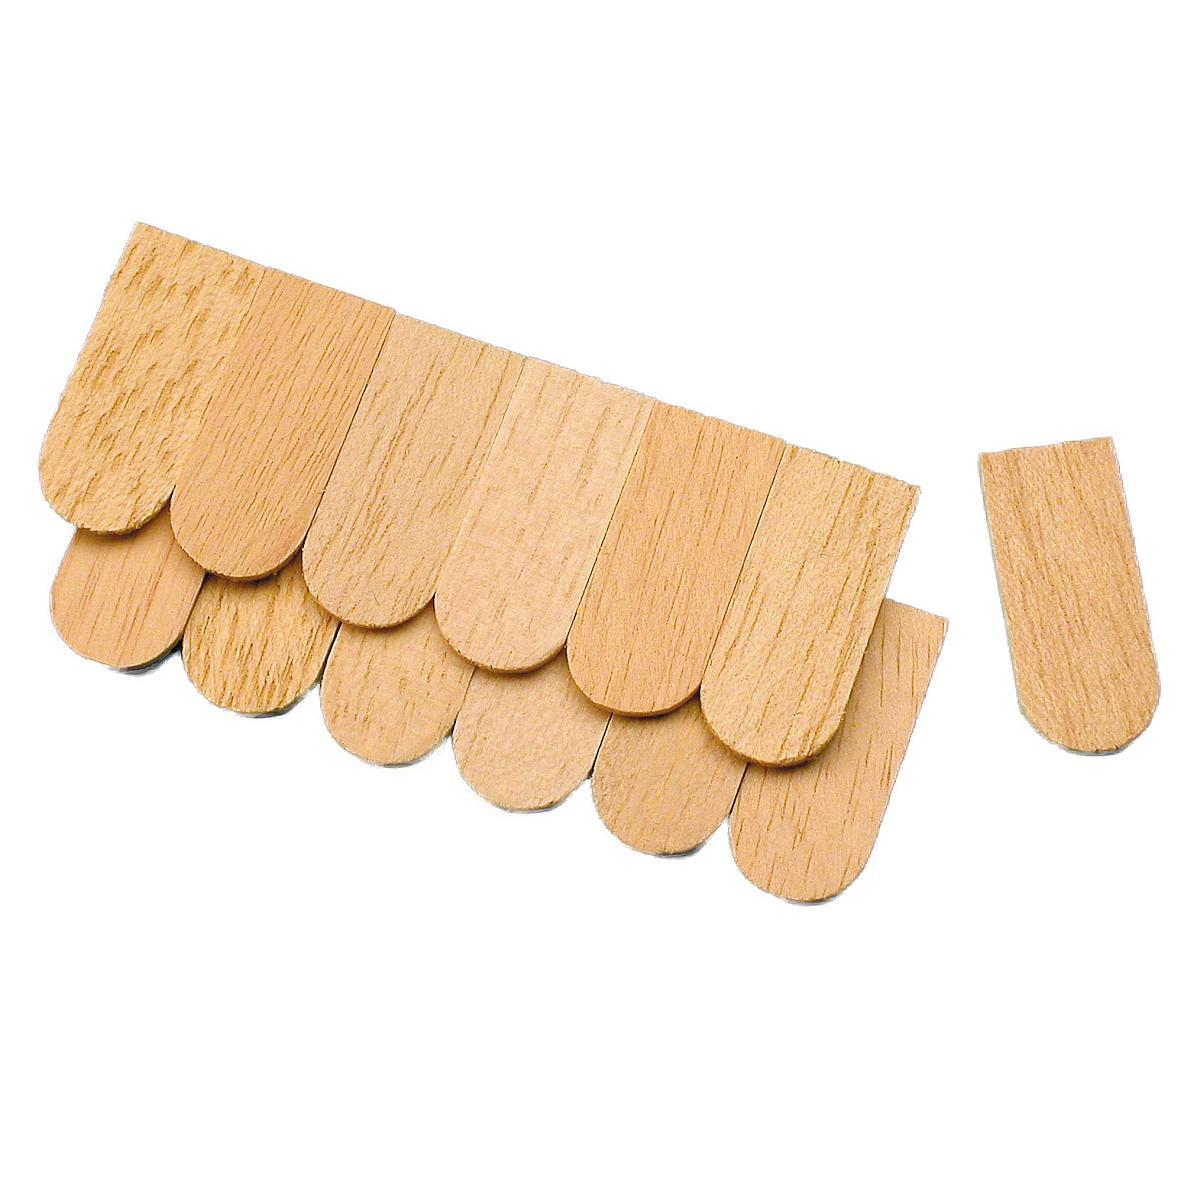 Narrow roof shingles - 100 pieces